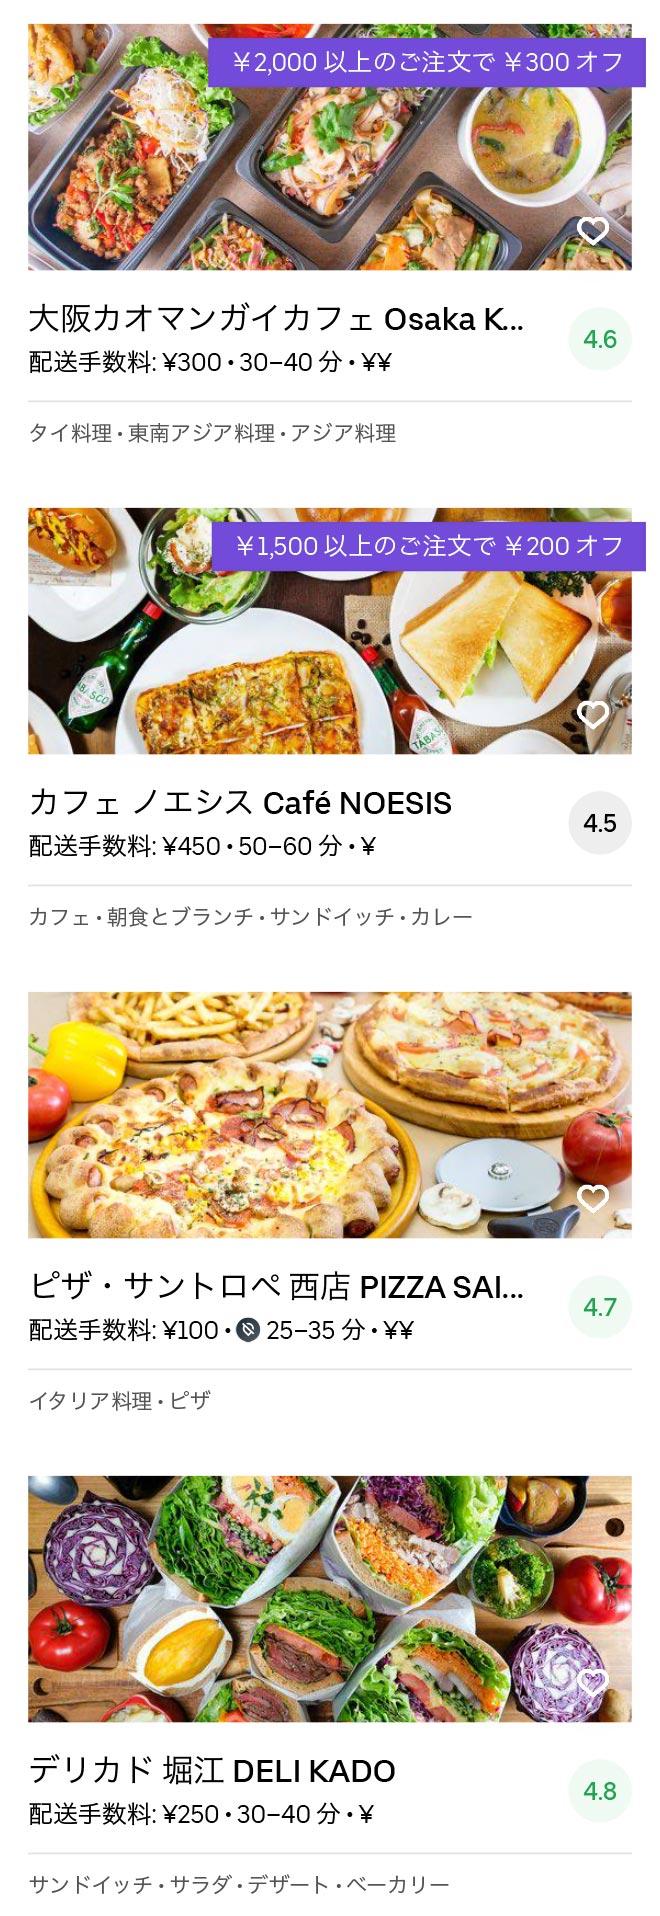 Osaka nishi kujo menu 2005 11